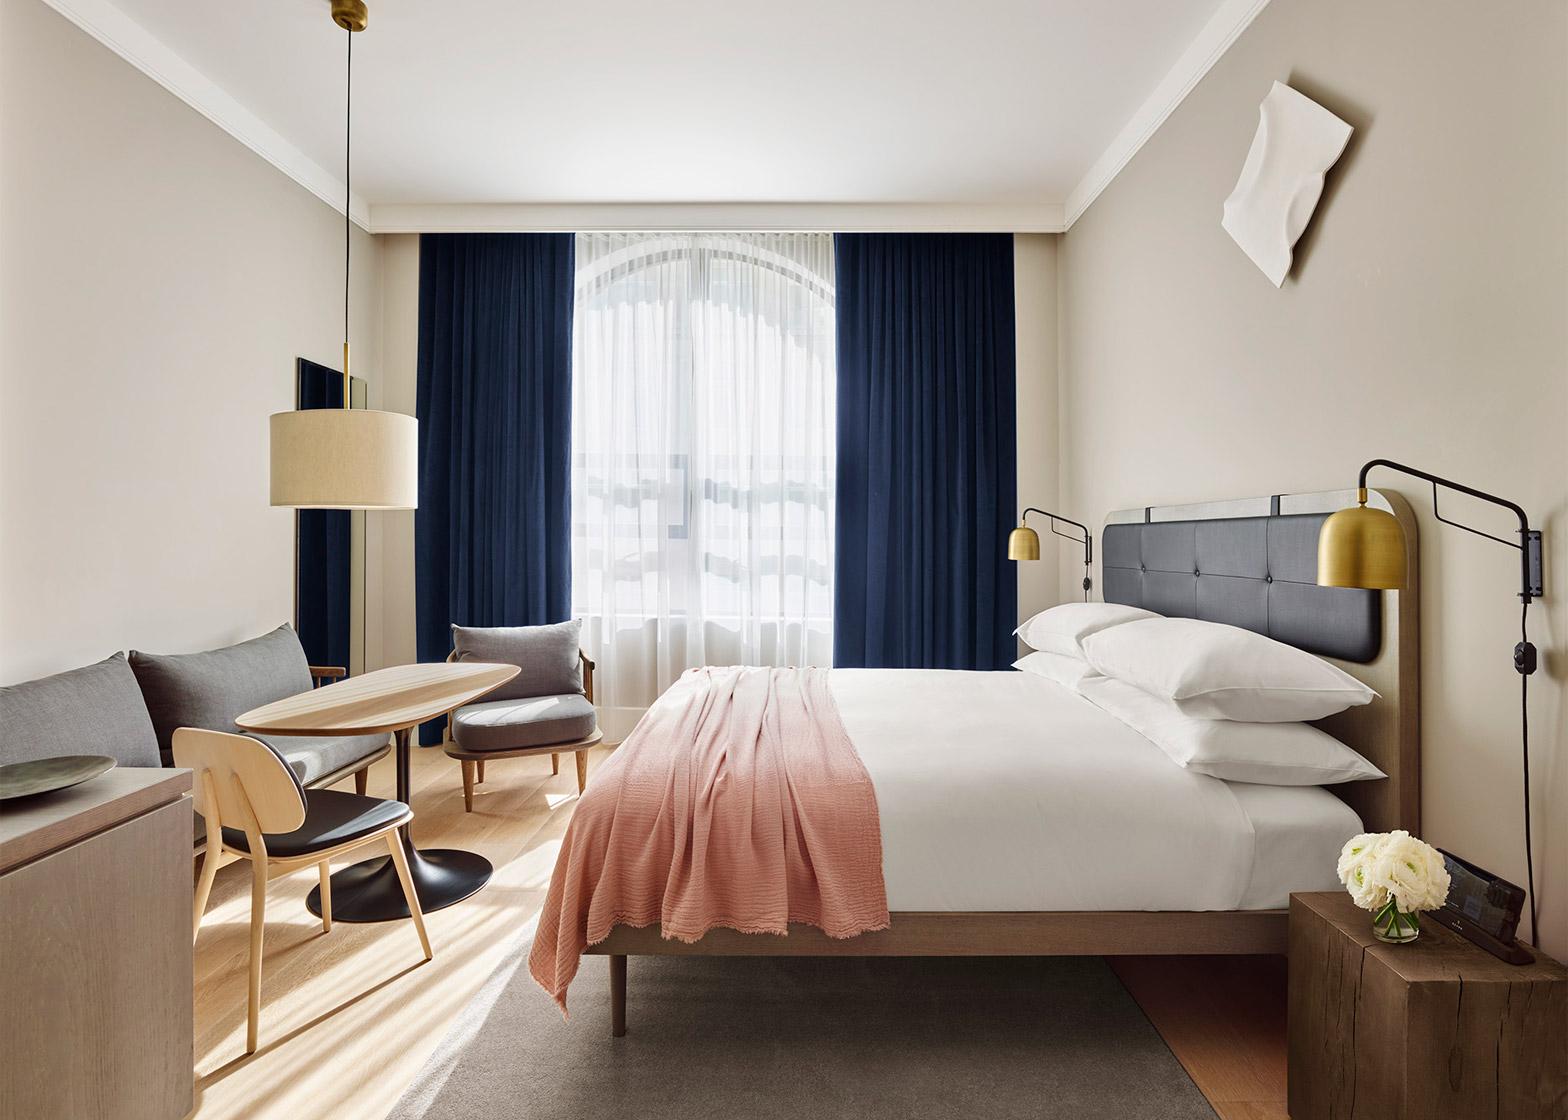 11-howard-space-copenhagen-hotel-interior-new-york-city-soho-usa_dezeen_1568_9